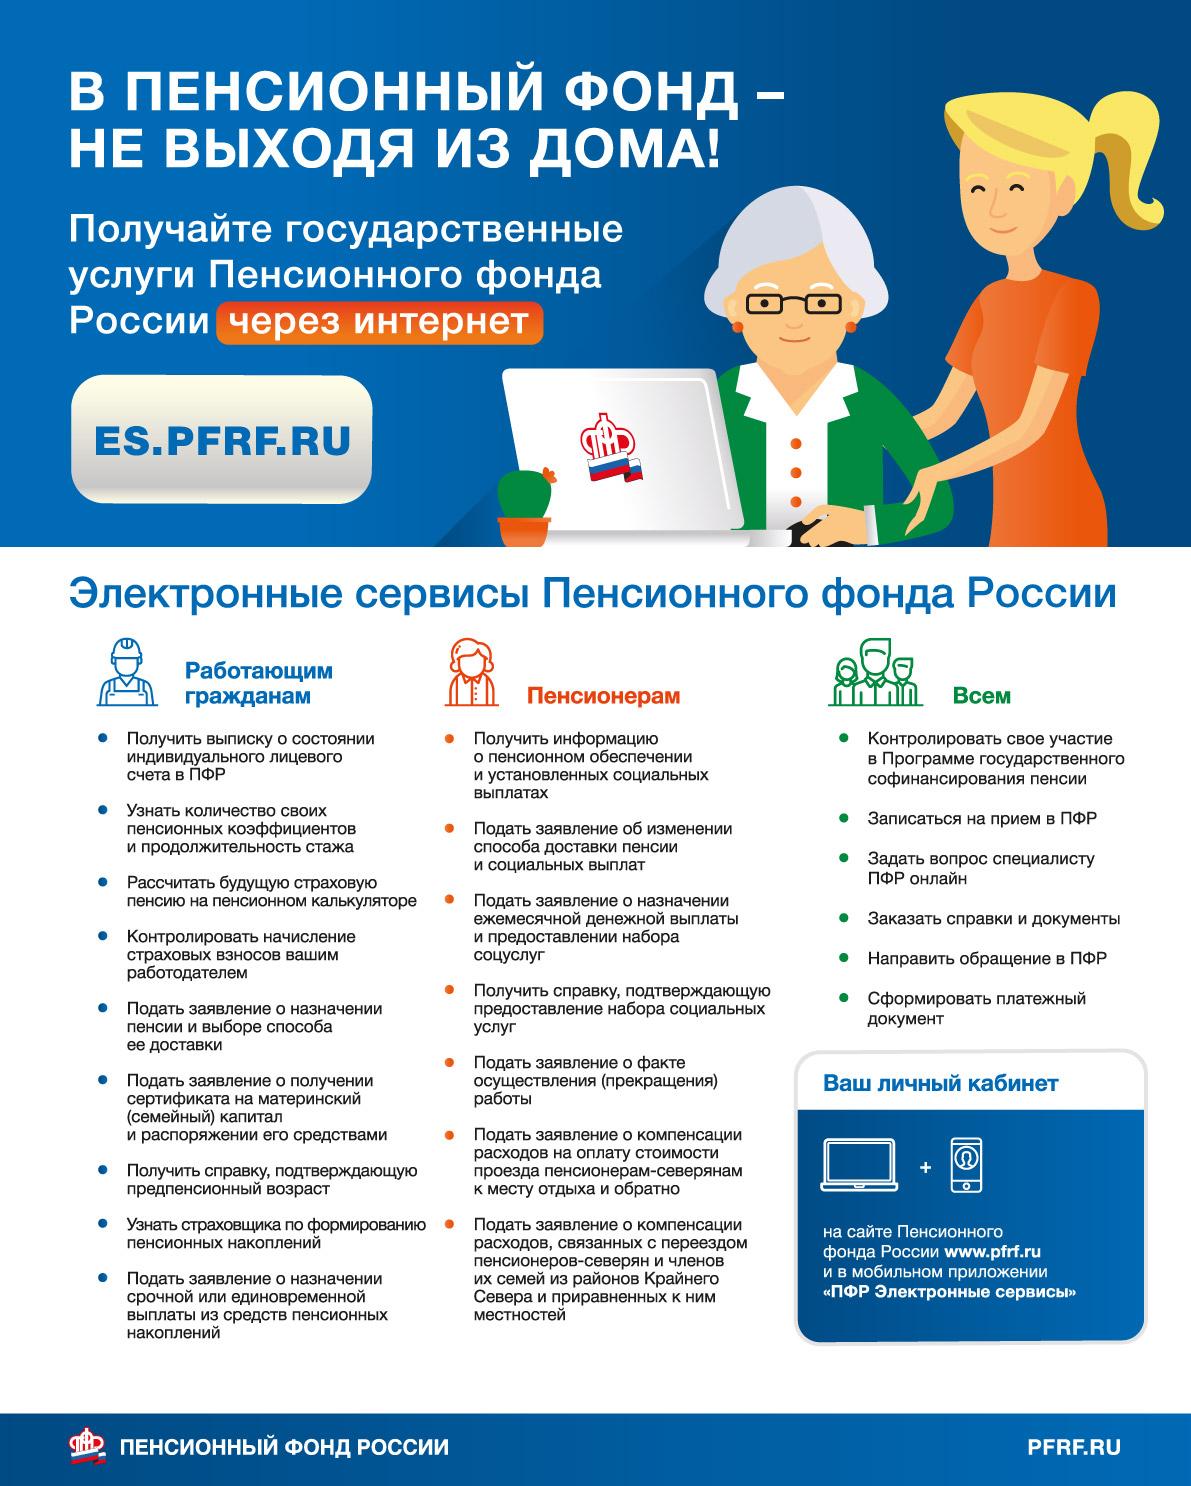 SPEKTR_AUDIT_PFR_internet_uslugi_2020